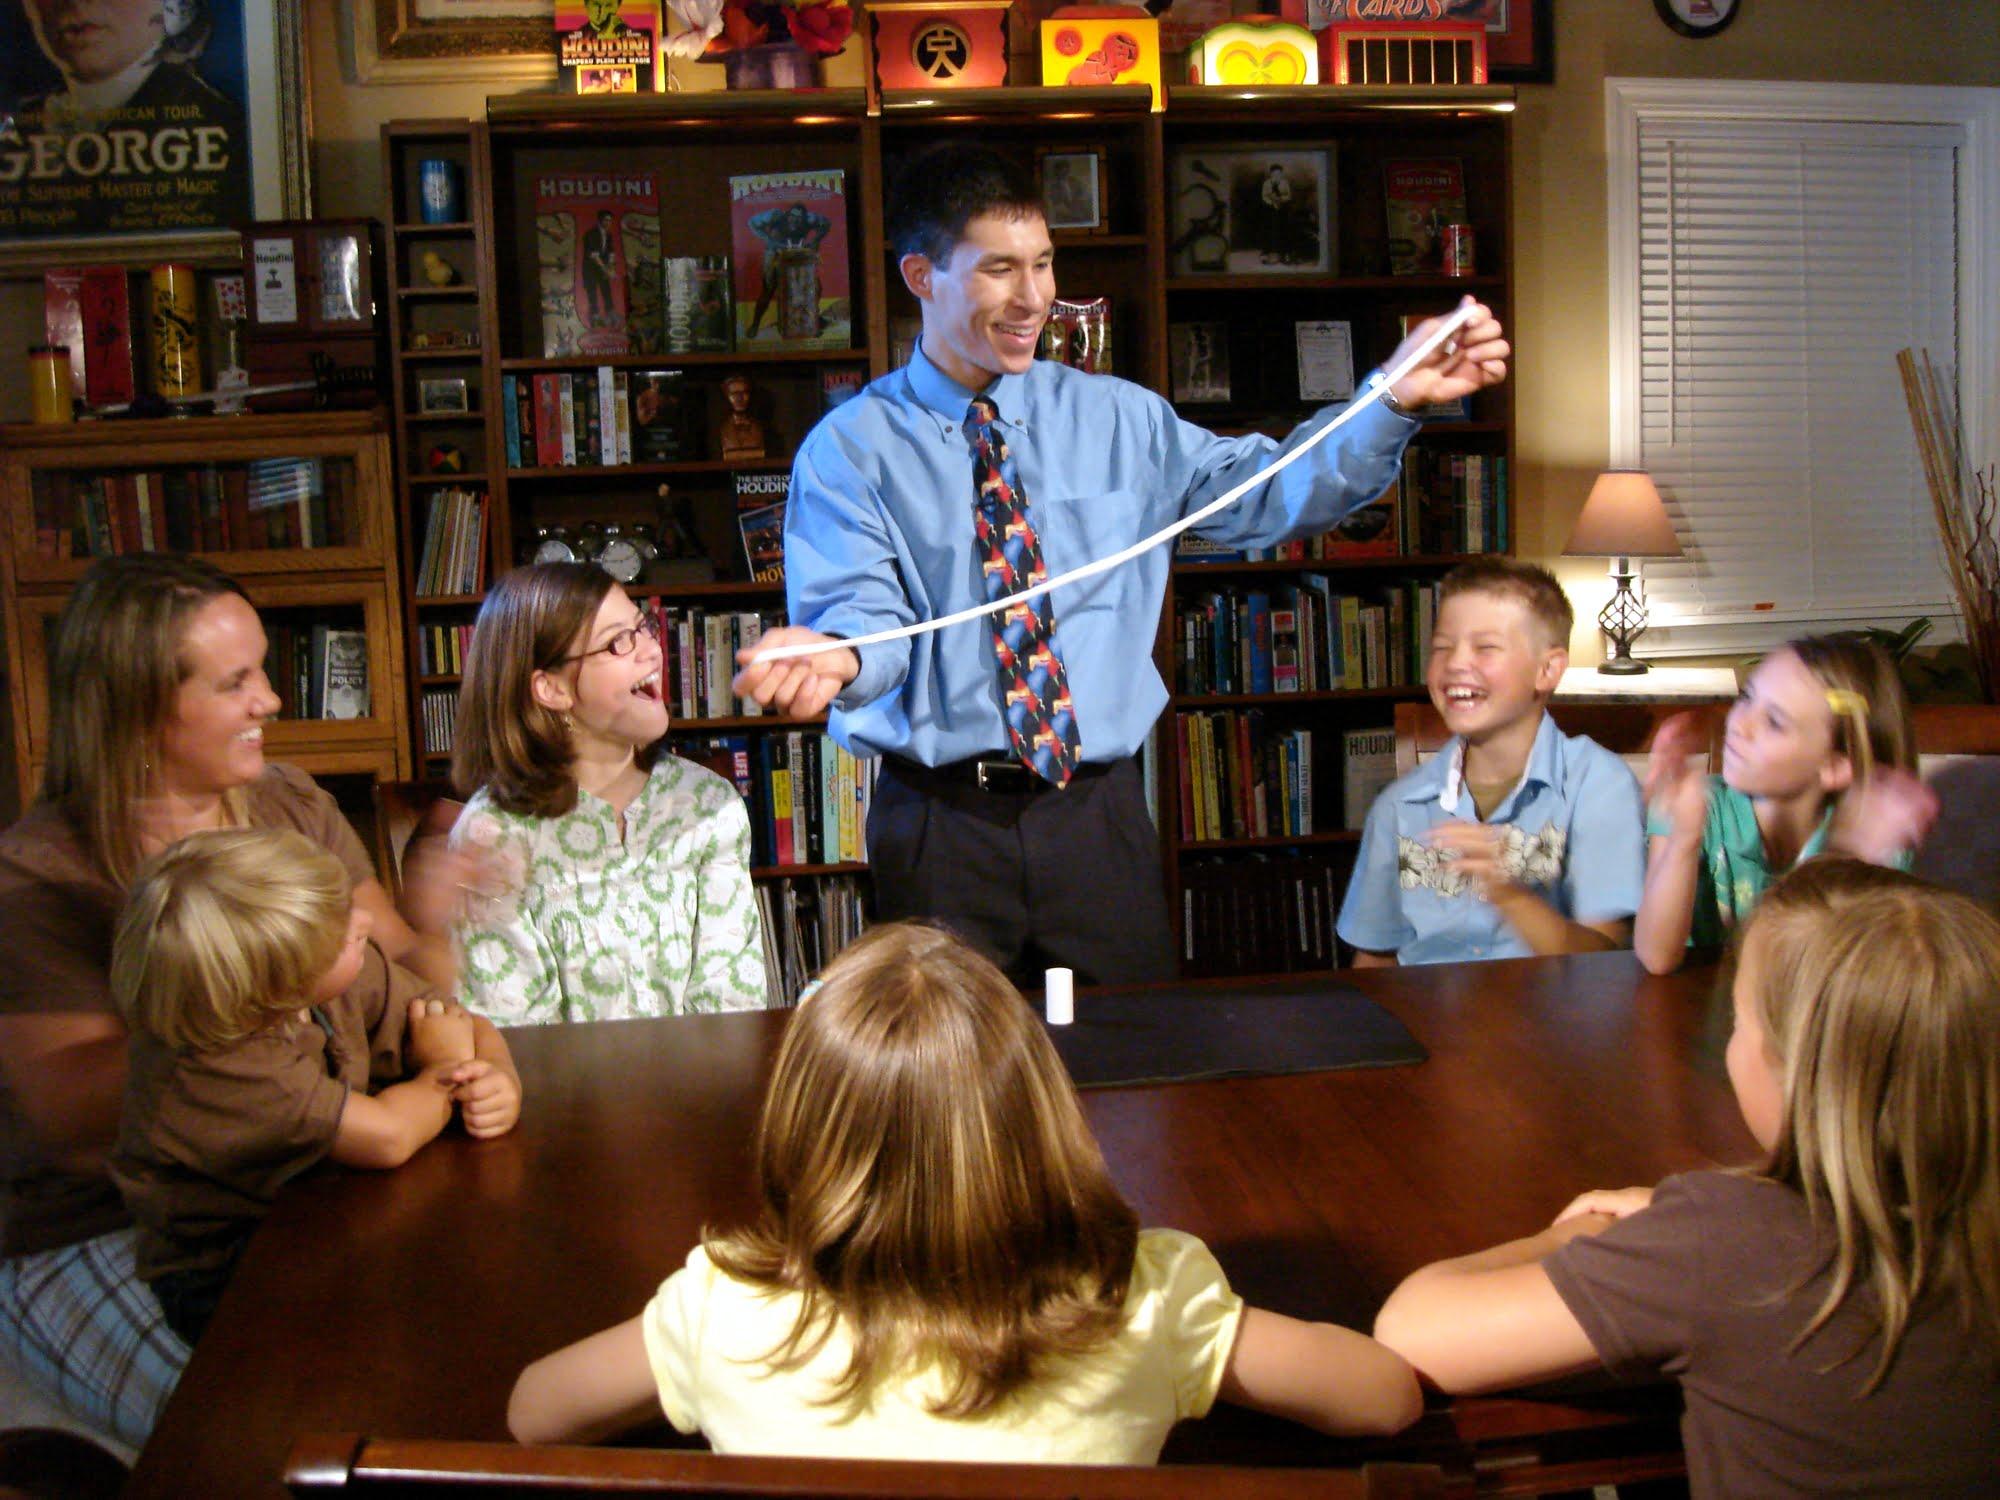 Familie, Foto: sciencemagicvideos.com